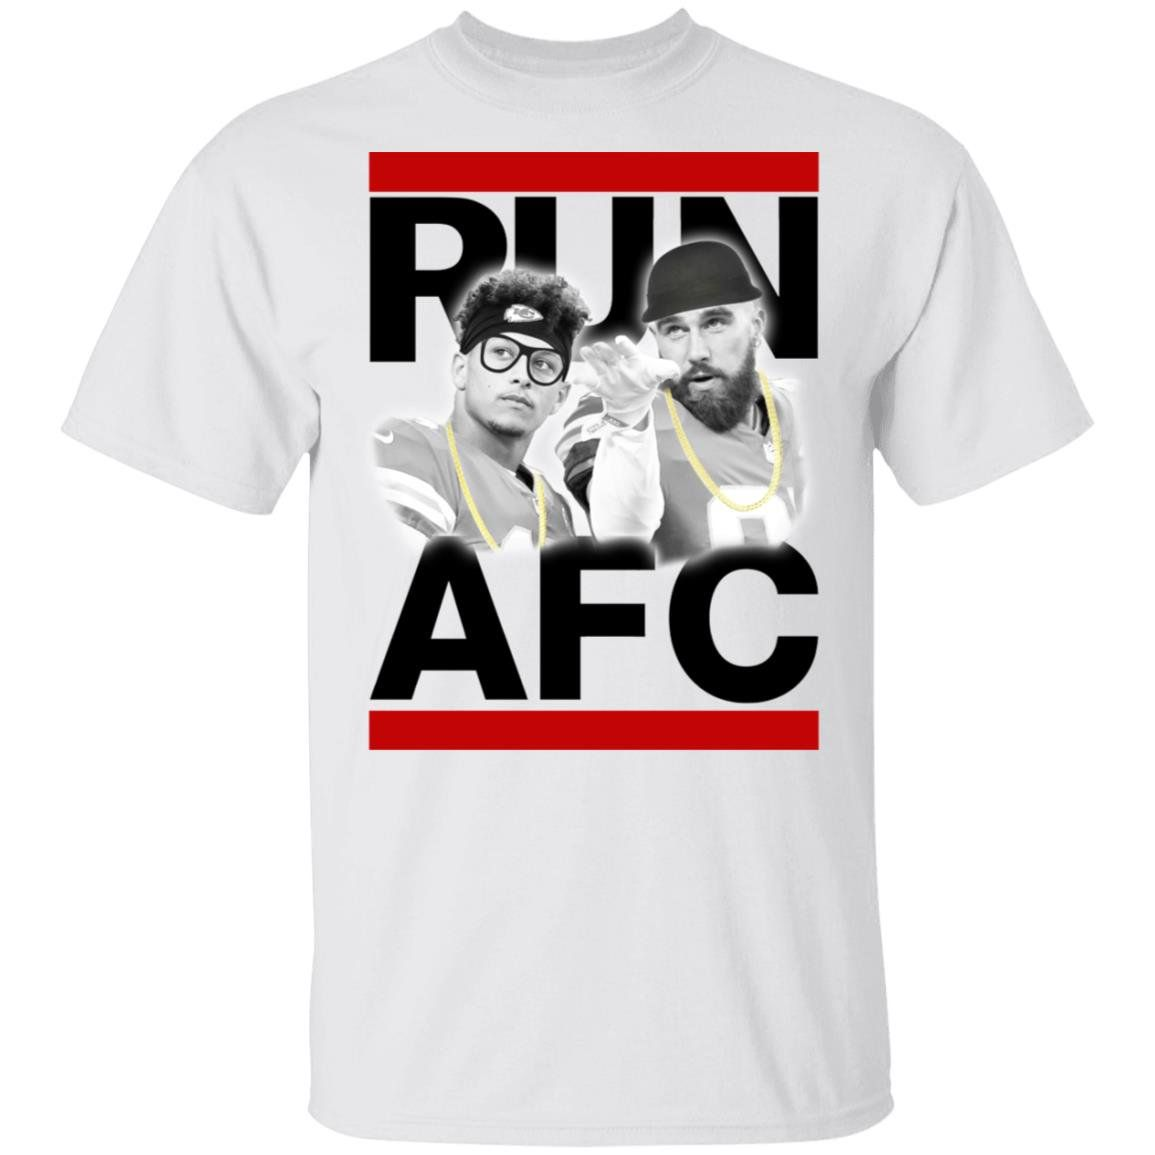 Patrick Mahomes Travis Kelce Run AFC shirt TShirt White S